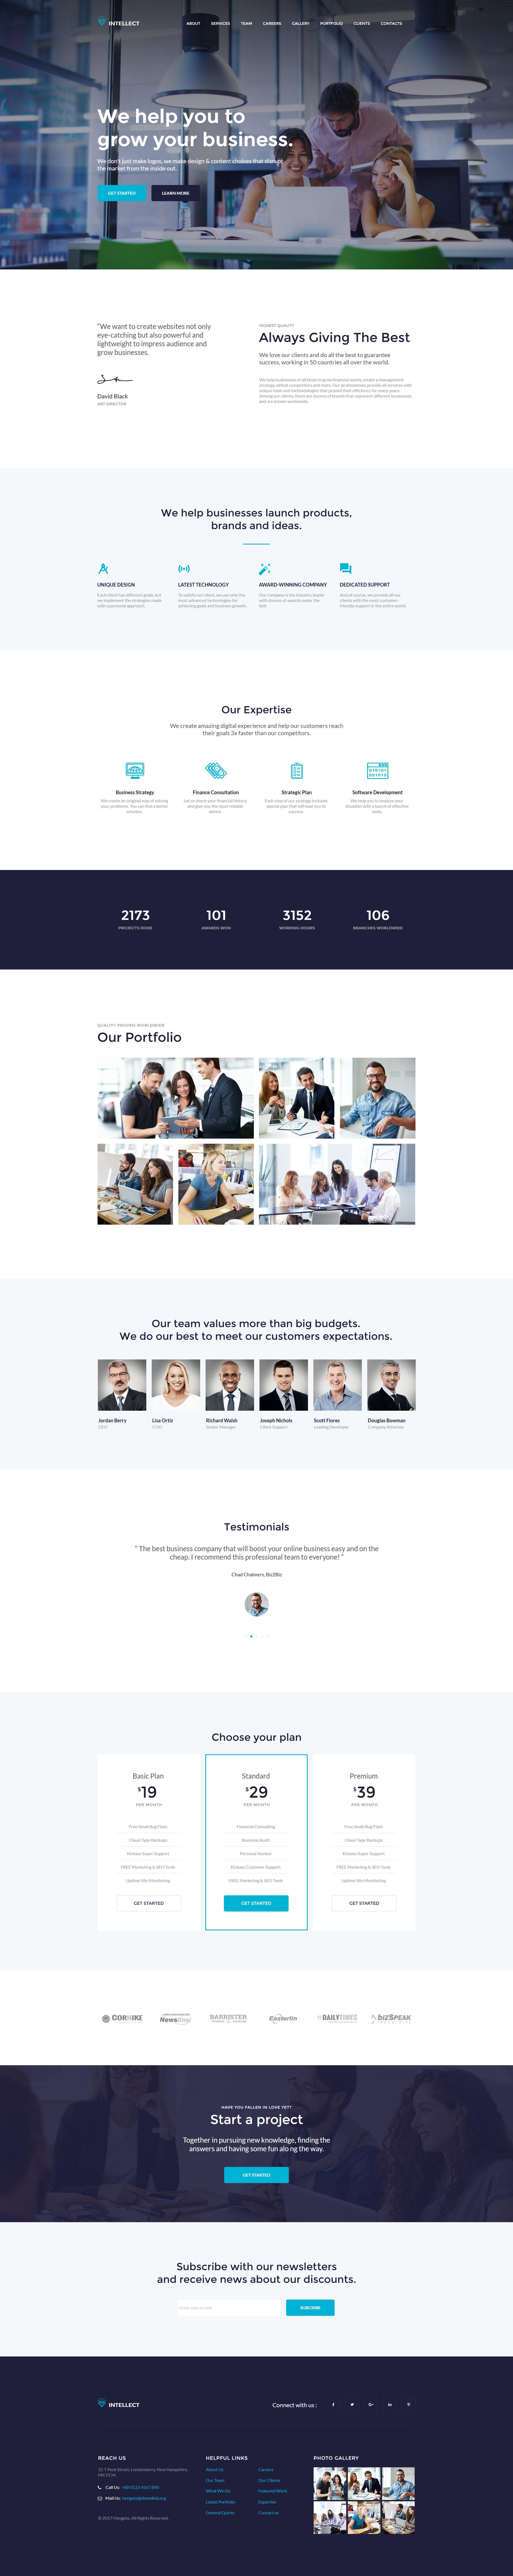 Intellect - Business Template Moto CMS HTML №63444